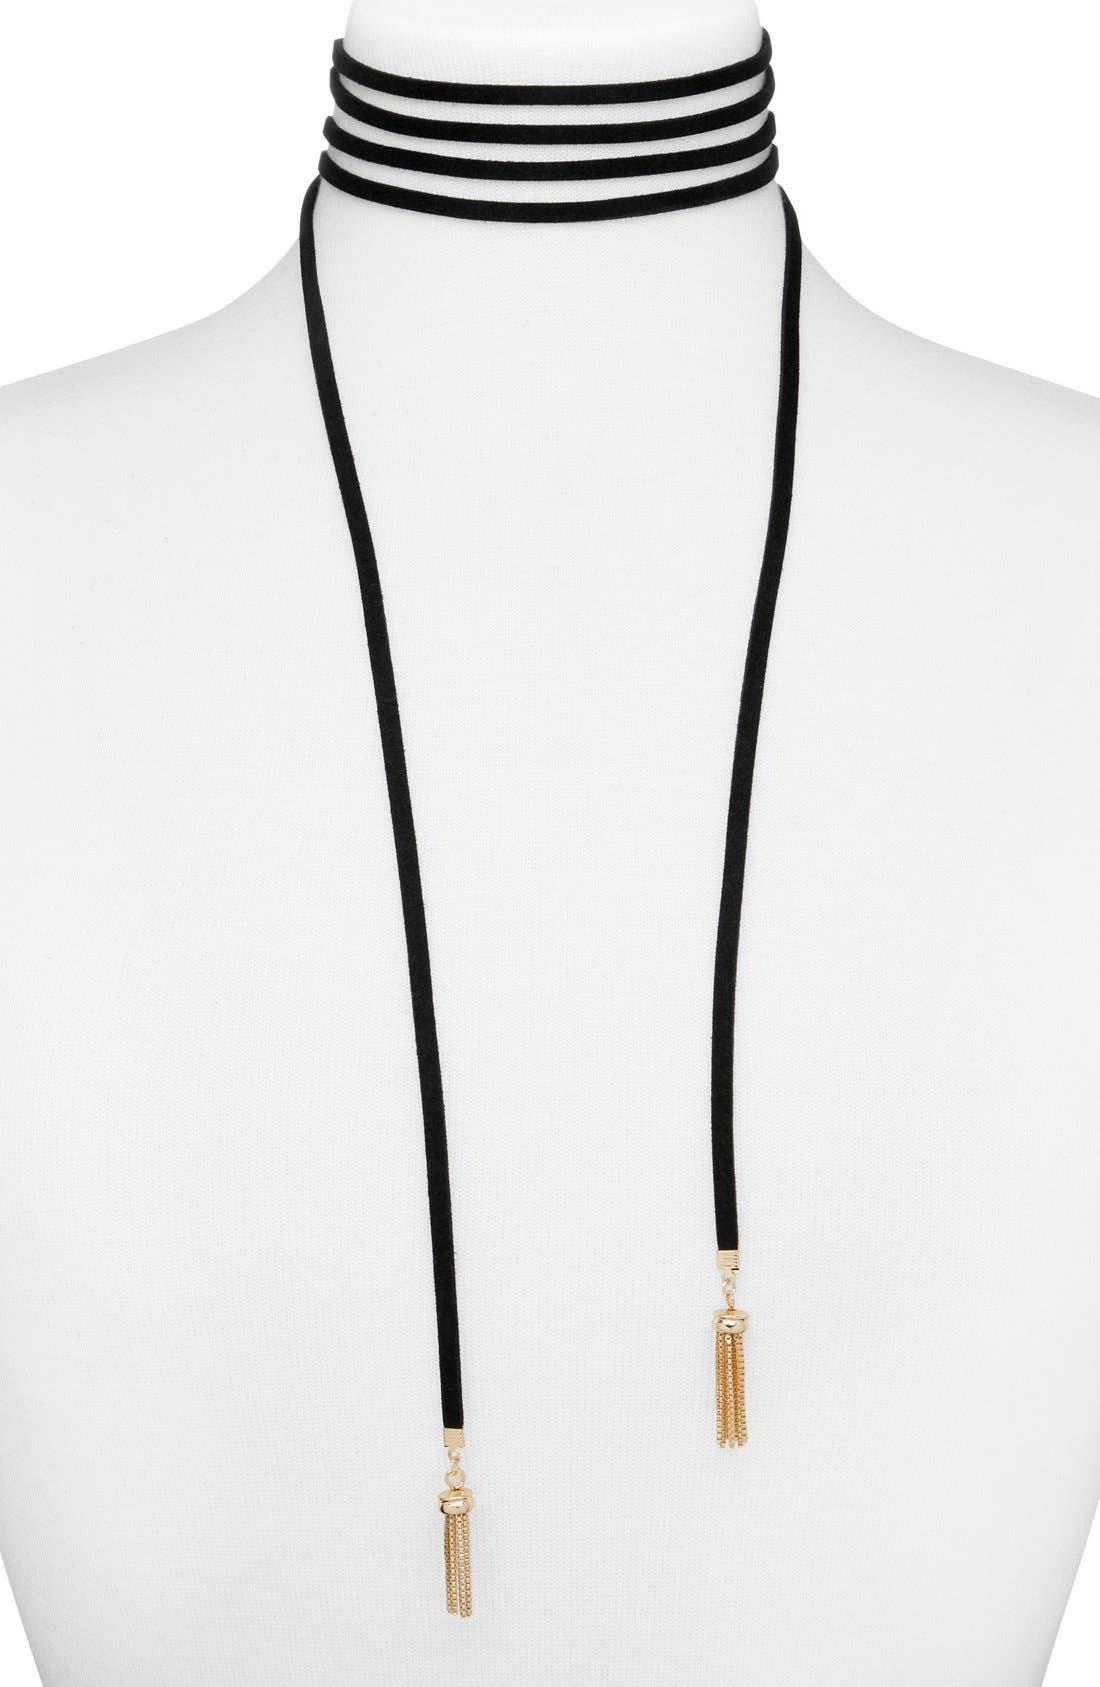 Main Image - BaubleBar Lariat Choker Necklace